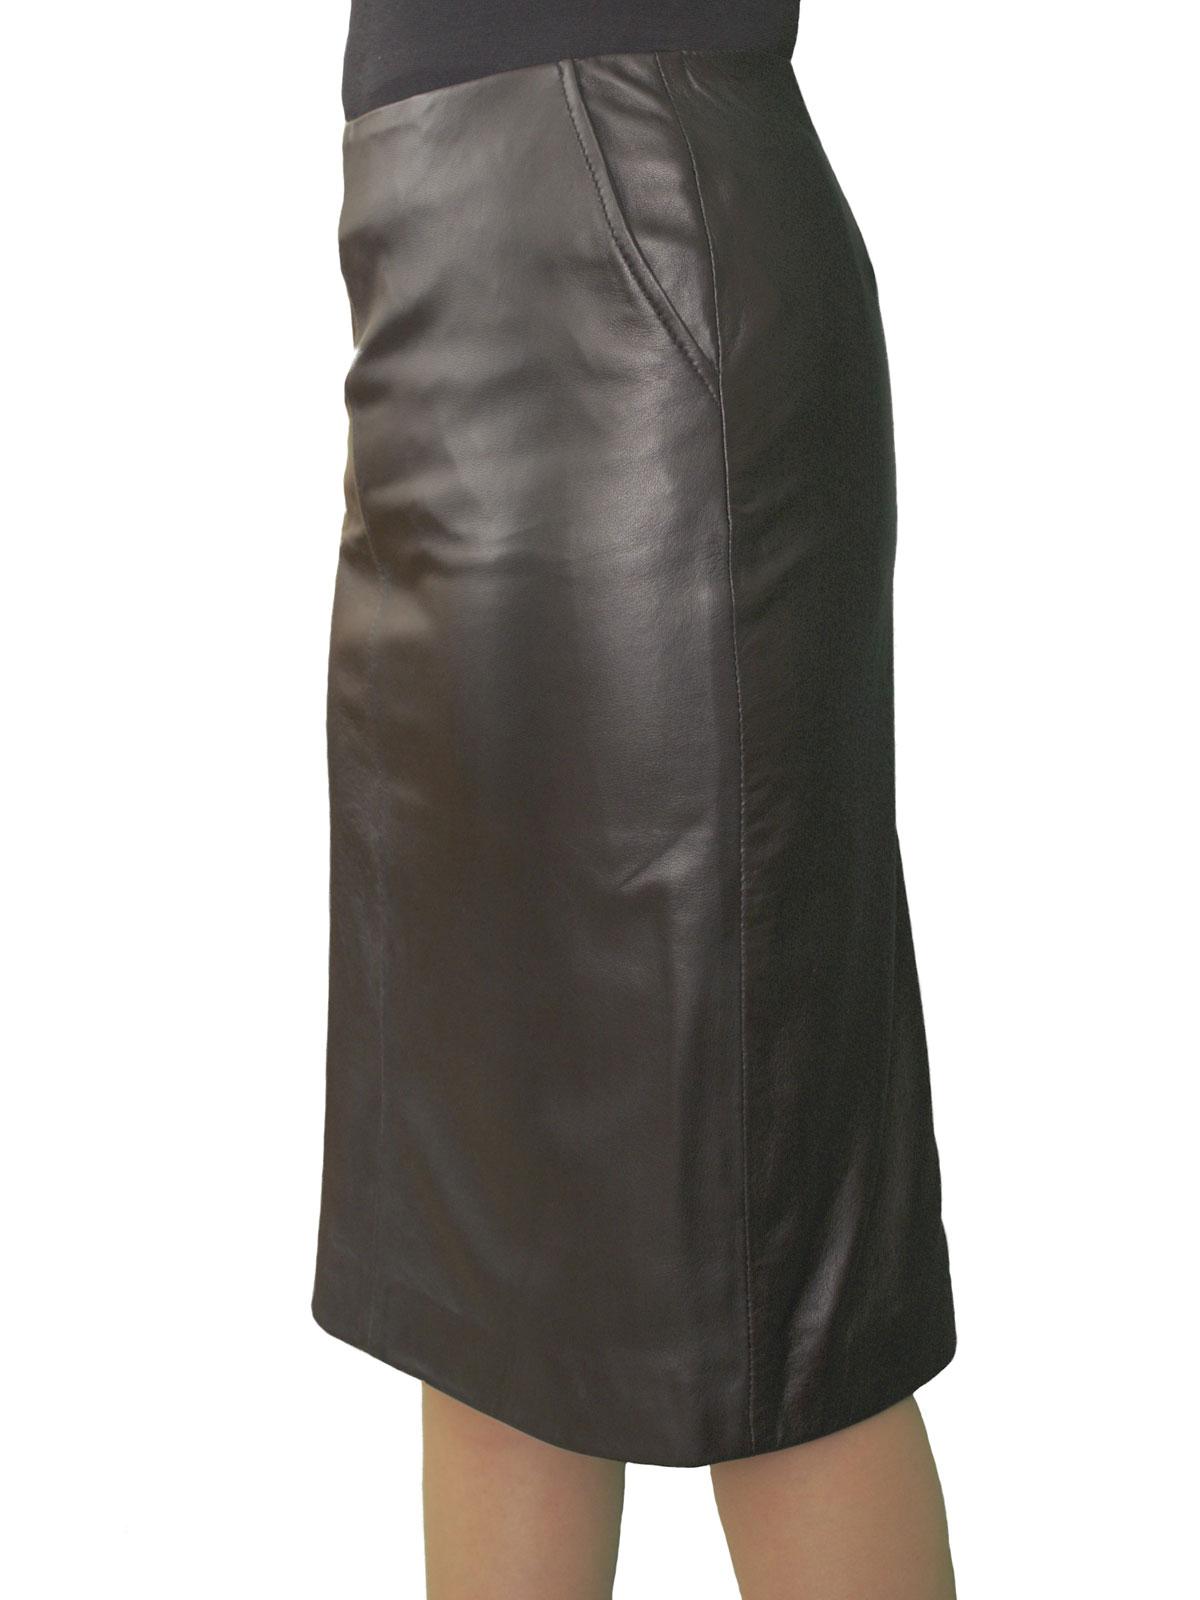 leather pencil skirt luxury soft knee length tout ensemble